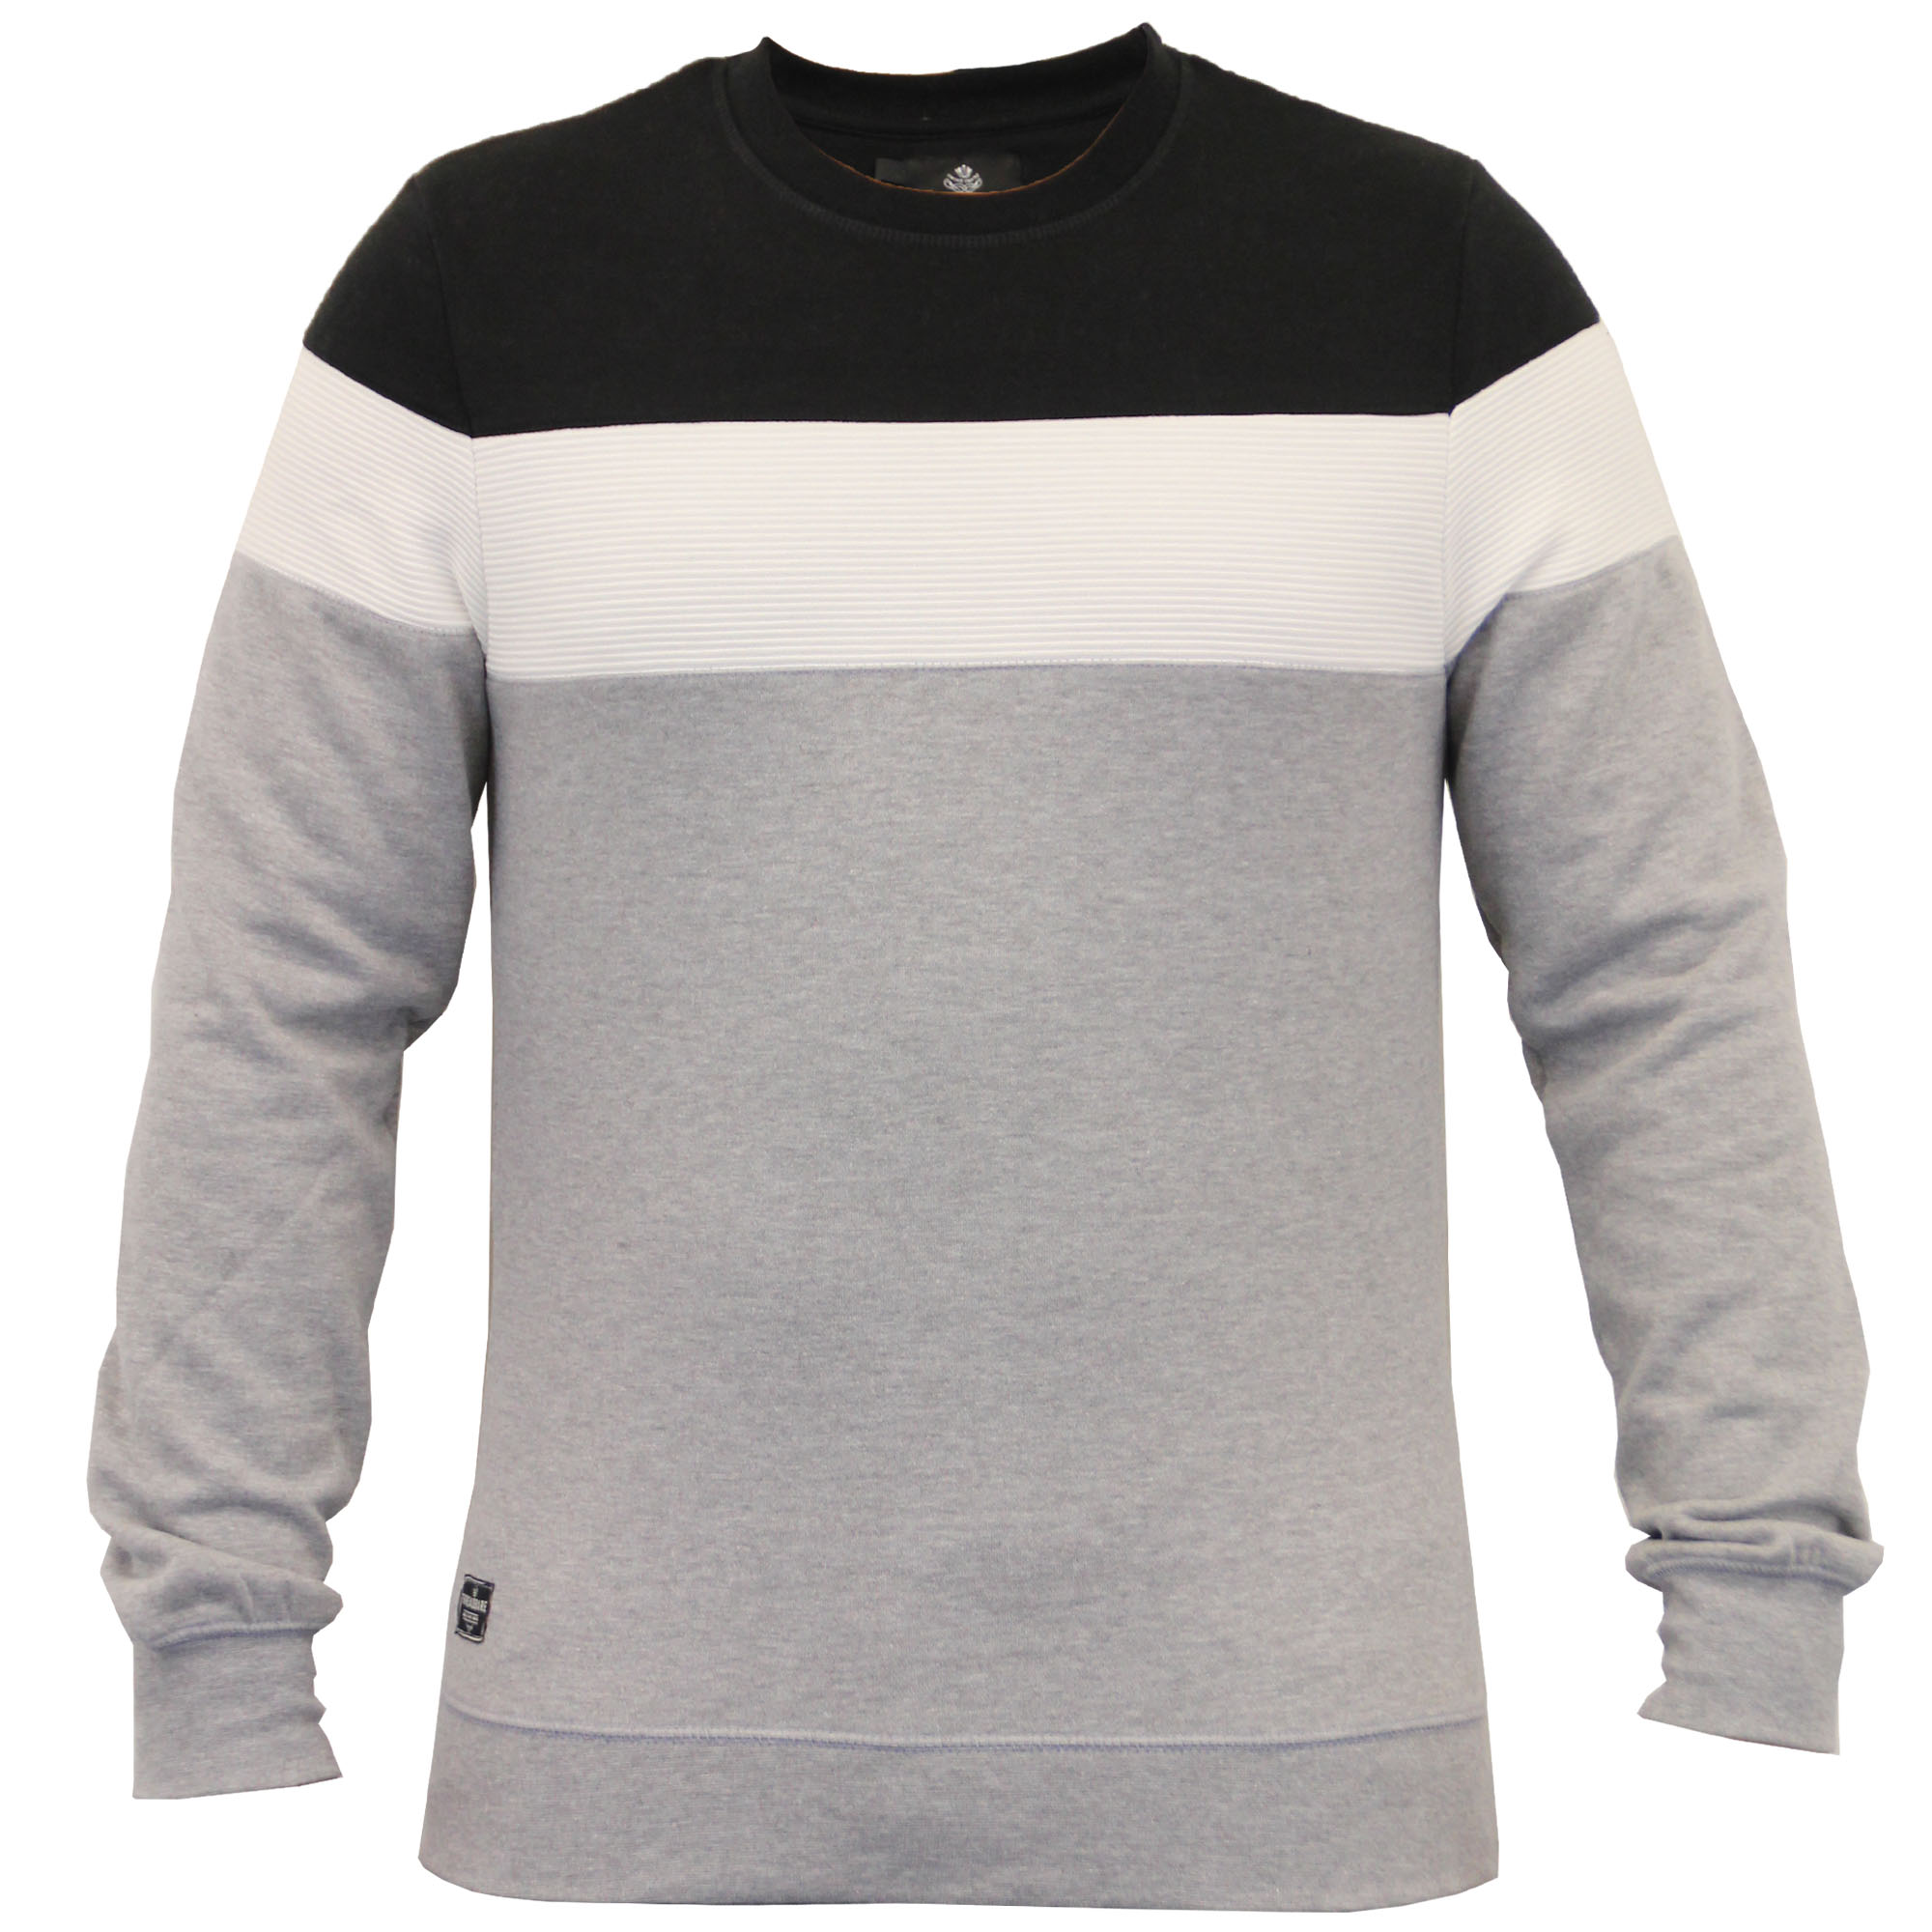 Mens-Sweatshirt-Threadbare-Pullover-Top-Block-Pattern-Fleece-Lined-Winter-New thumbnail 4